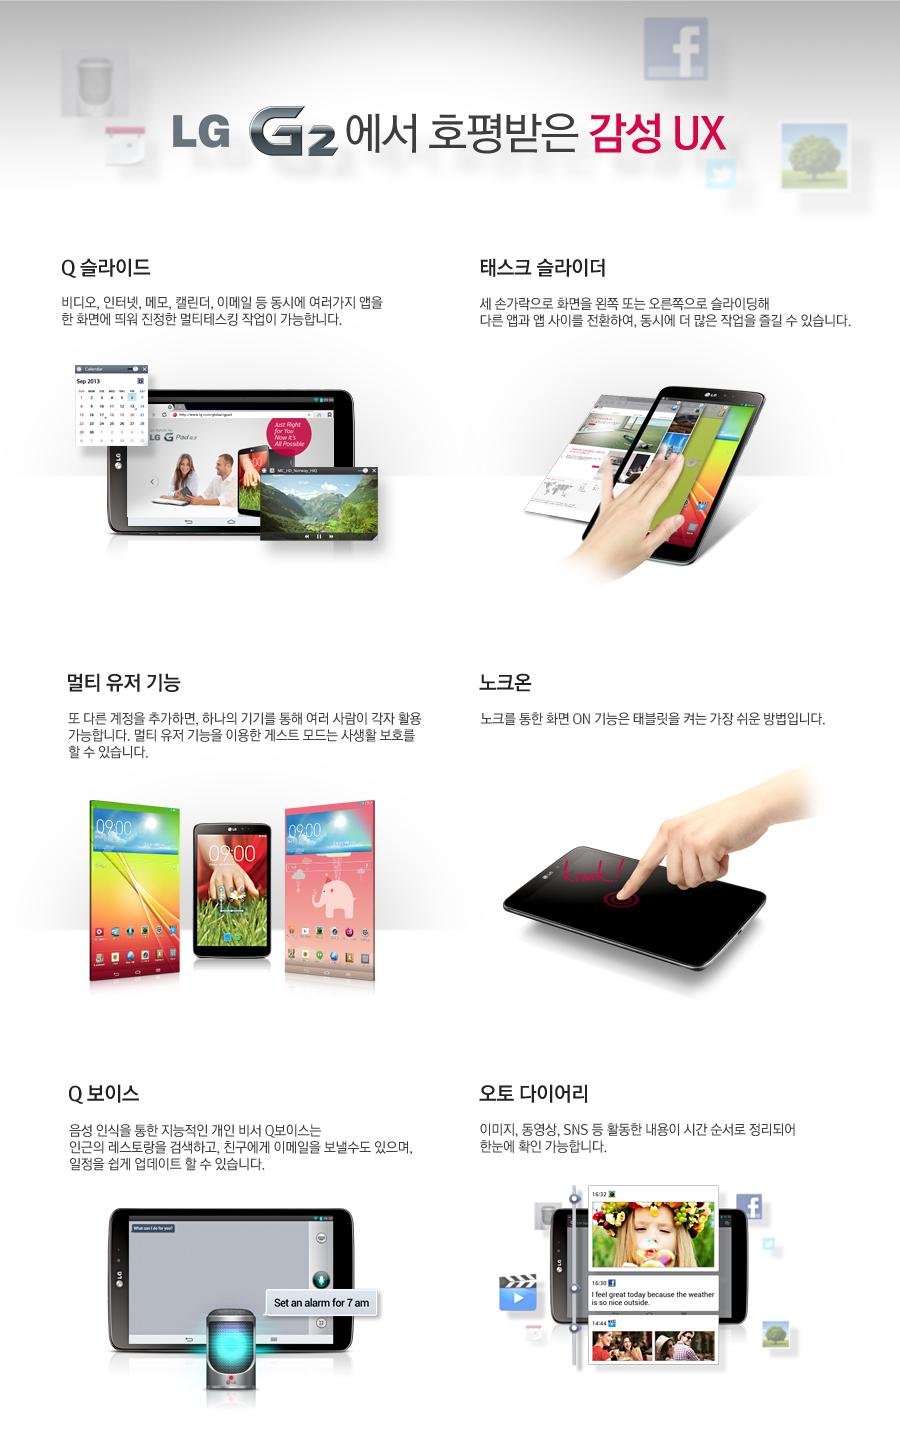 LG G2 에서 호평받은 감성 UX